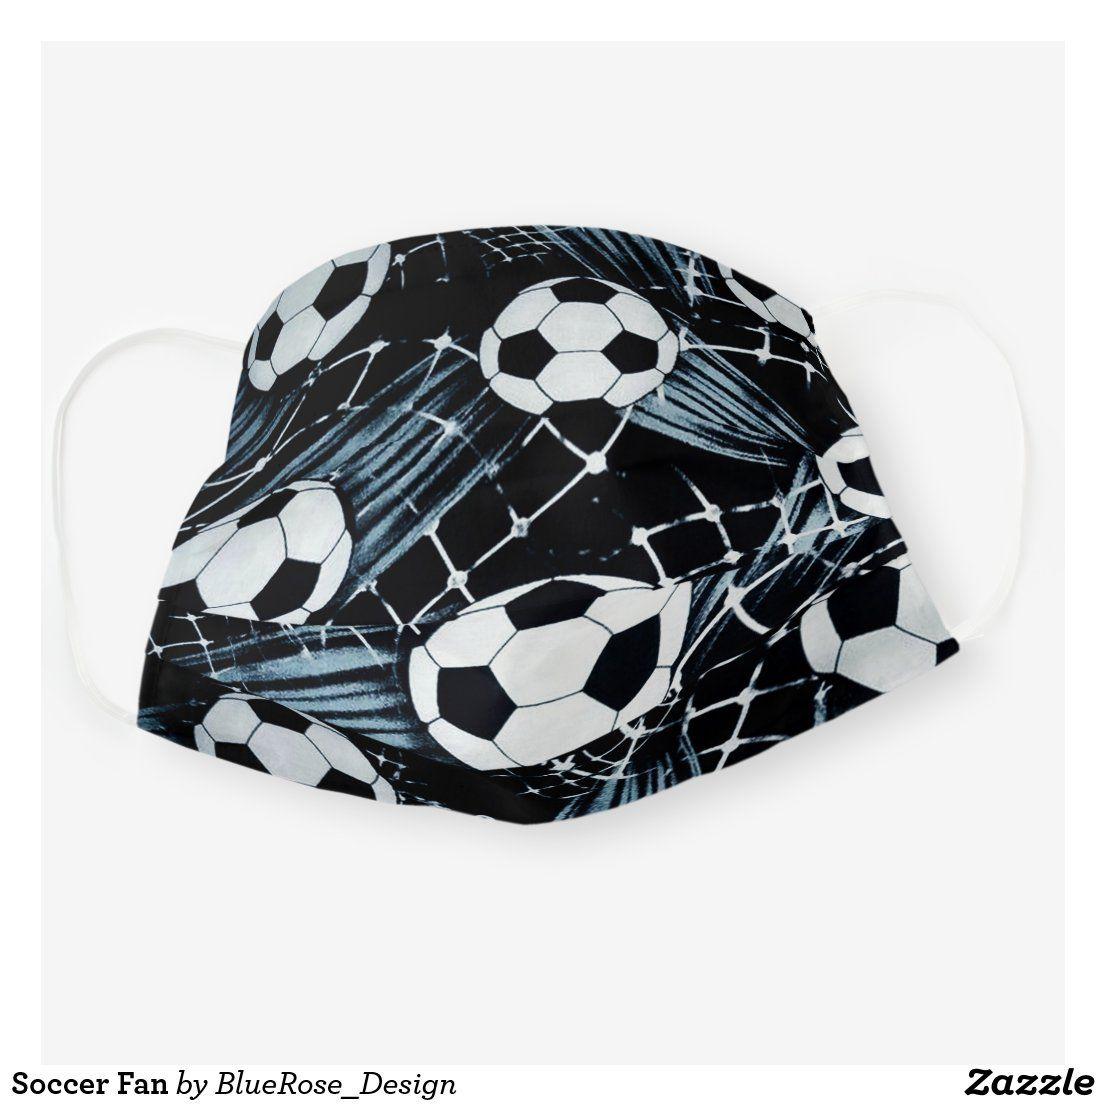 Soccer Fan Cloth Face Mask Zazzle Com In 2020 Face Mask Soccer Fans Mask For Kids